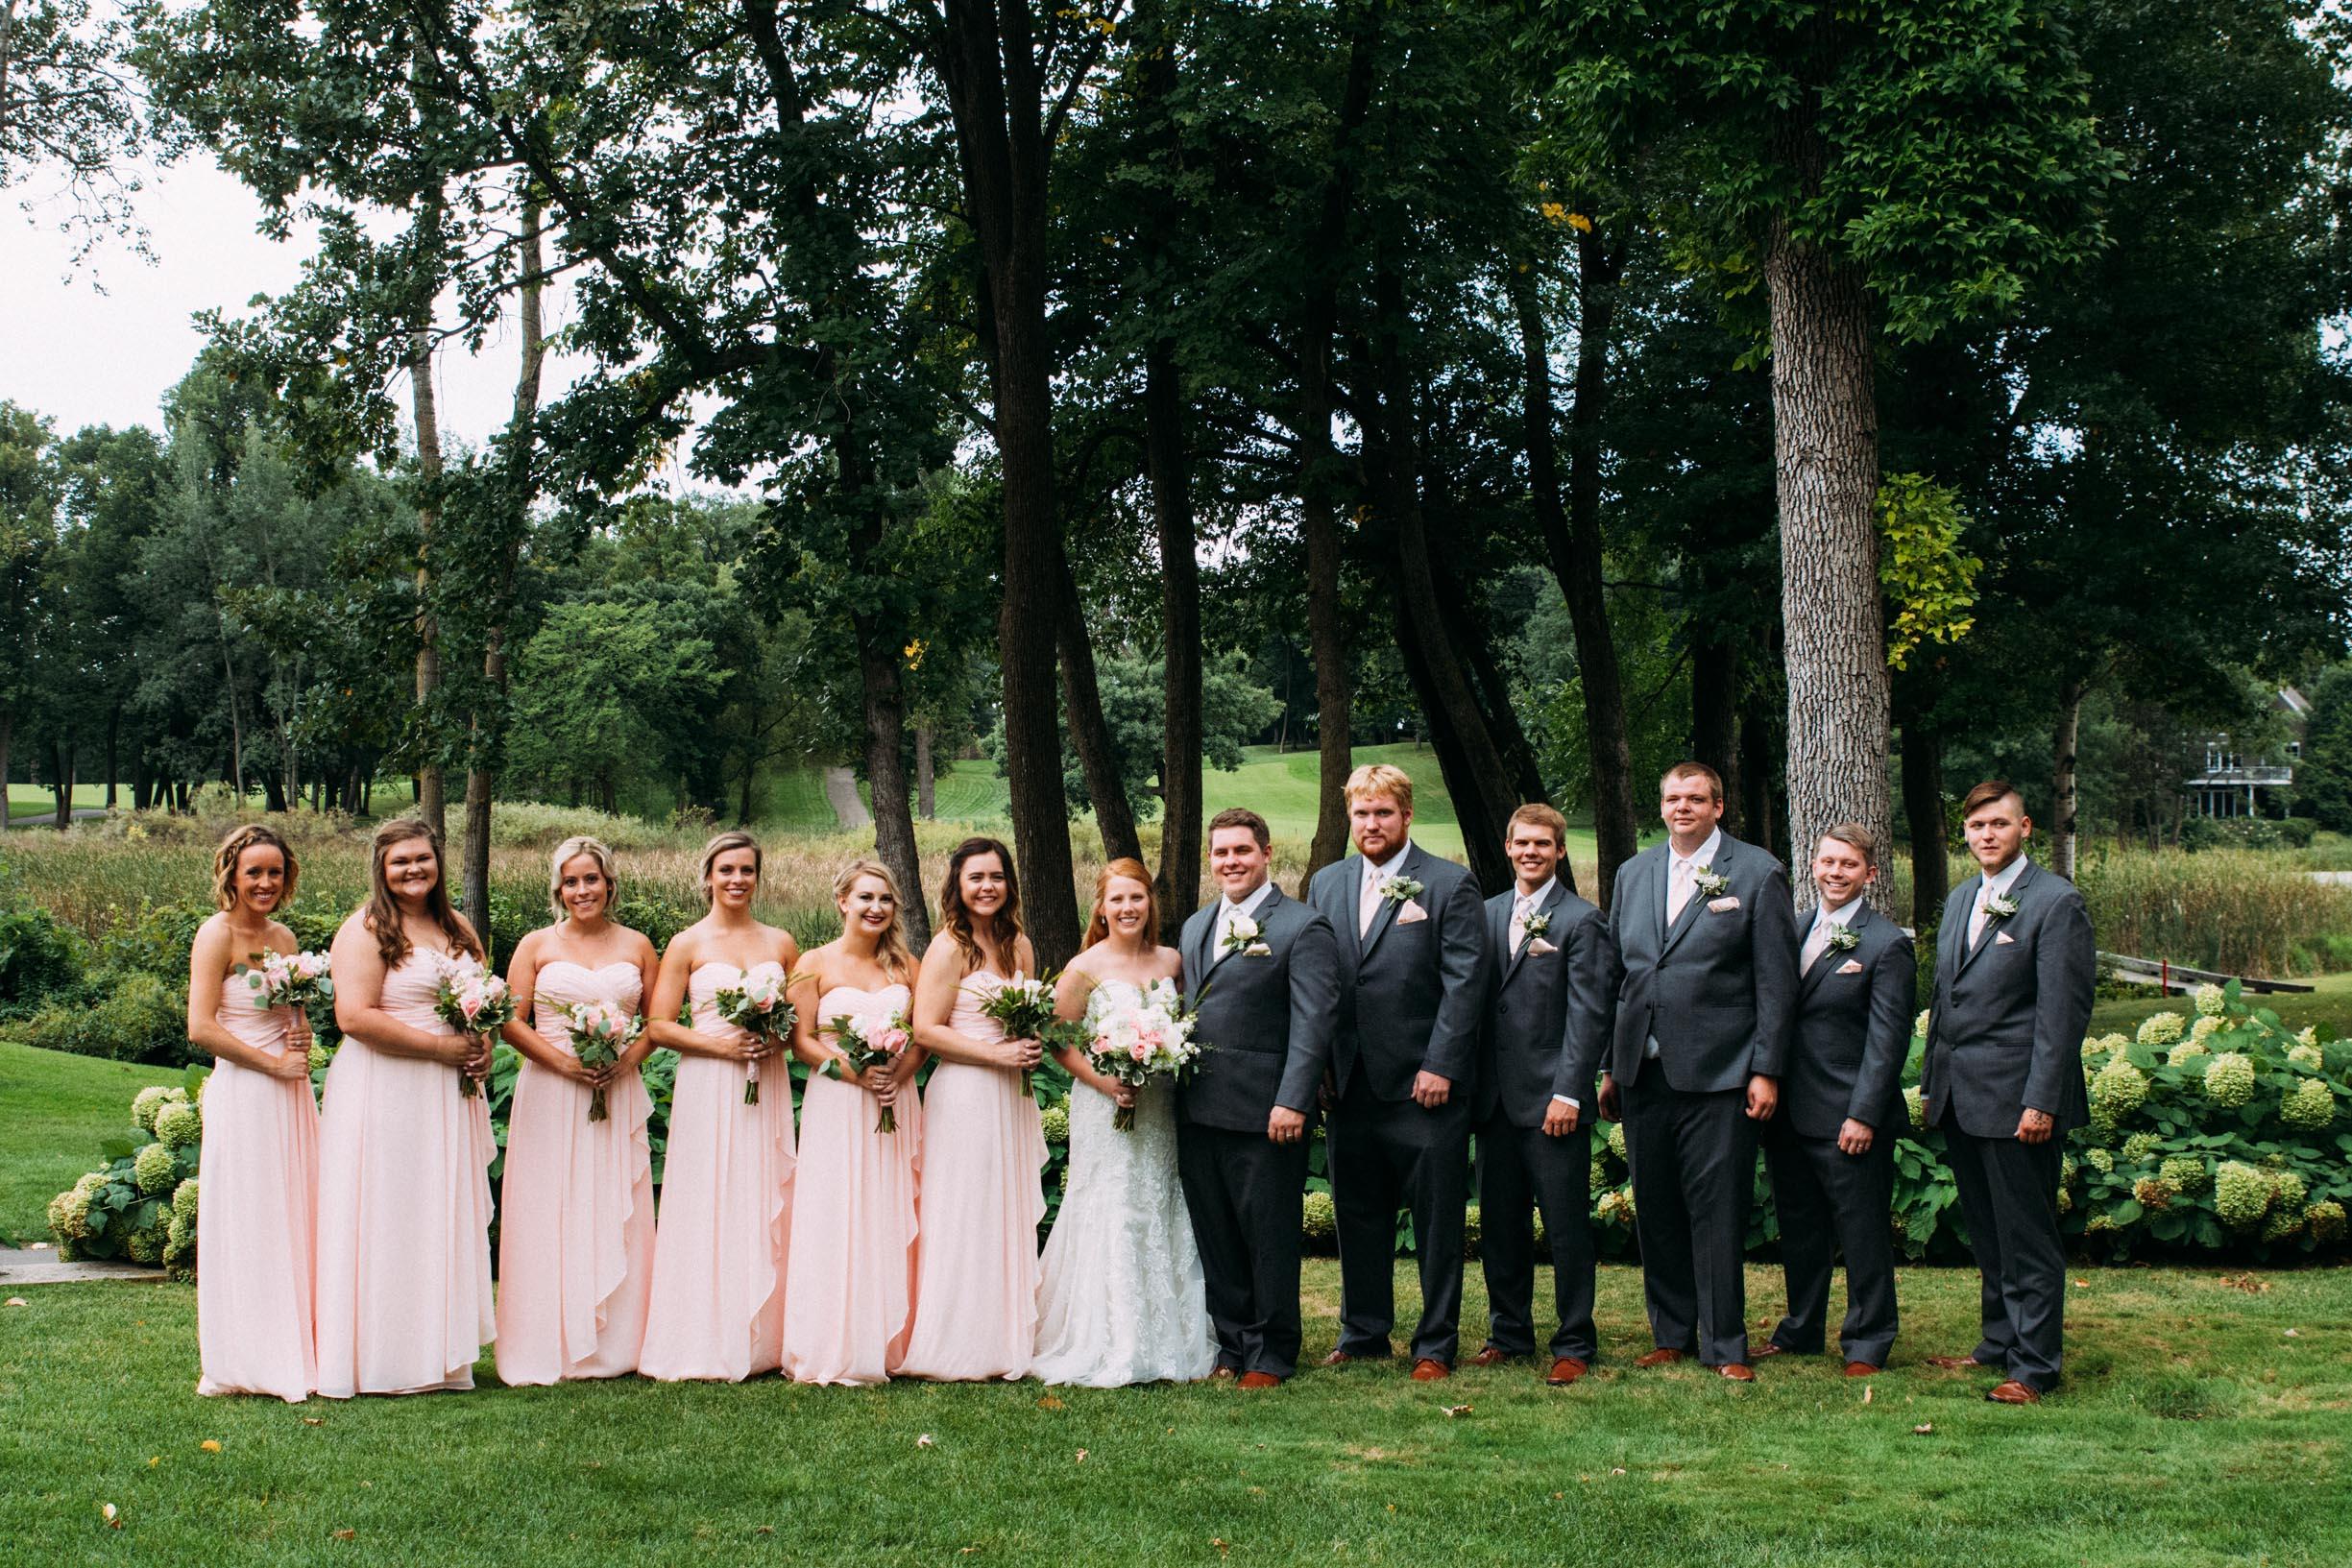 Megan_Zach_Minneapolis_Bearpath_Wedding_Blog-21.jpg